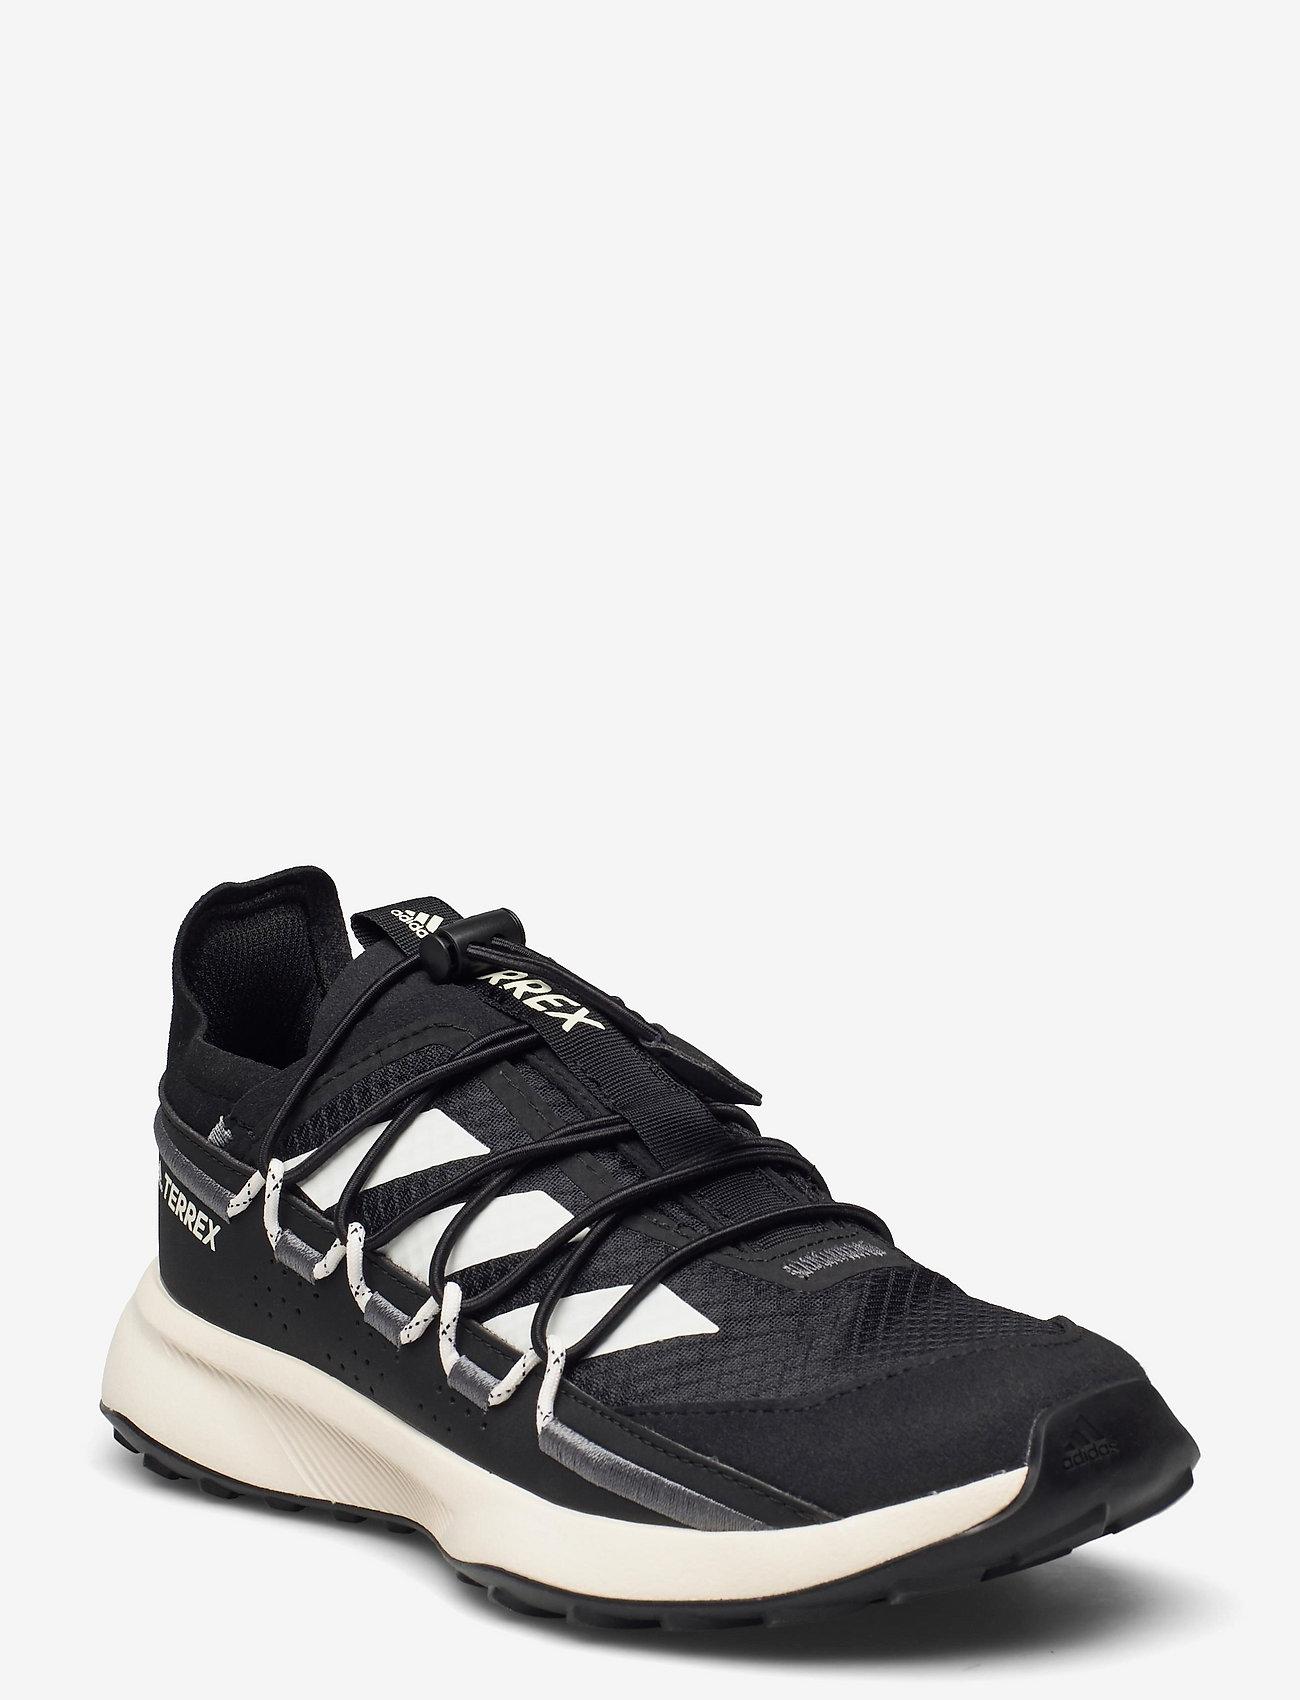 adidas Performance - Terrex Voyager 21 Travel  W - running shoes - cblack/cwhite/grefiv - 0